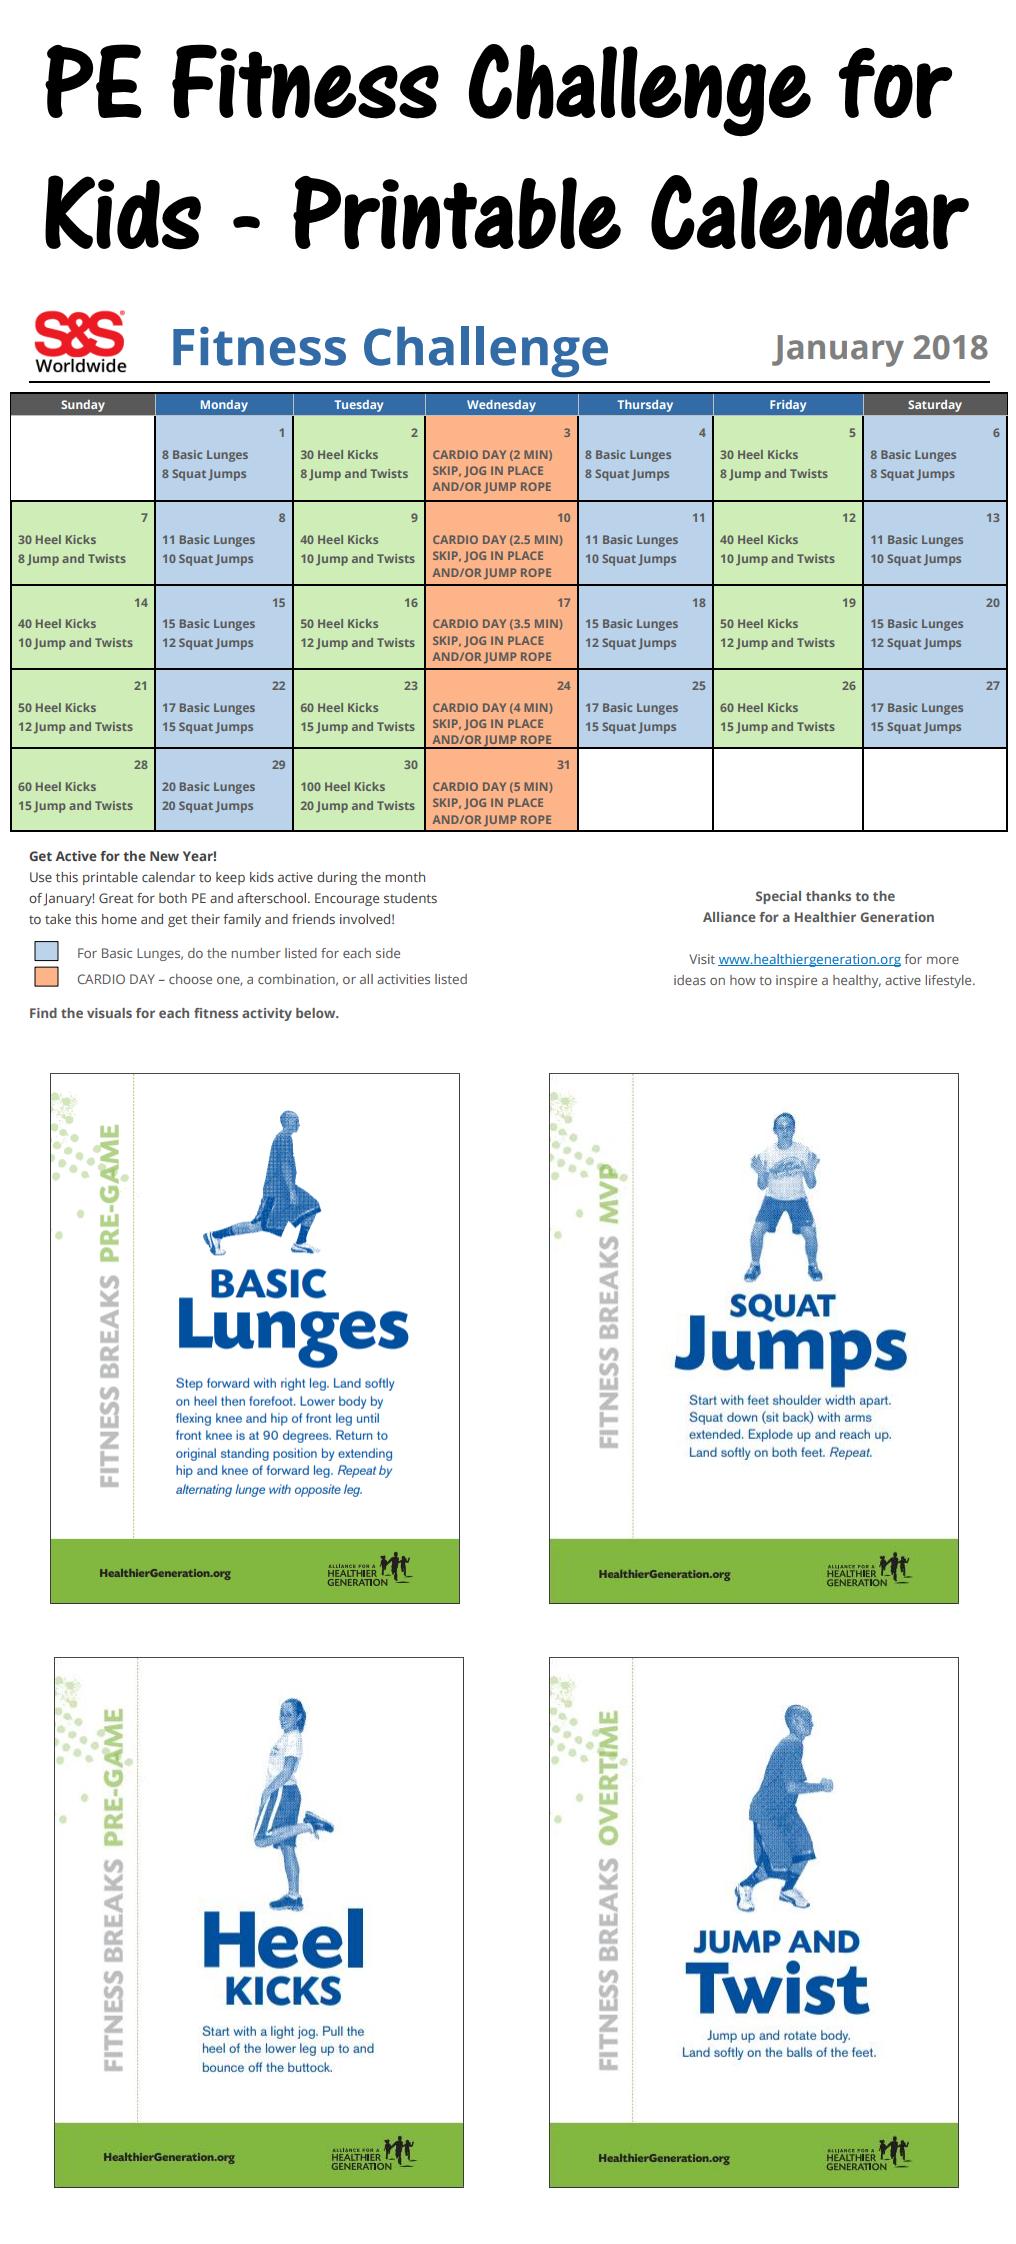 Fun Fit Calendario.Printable Fitness Challenge Calendar For Kids Keeping